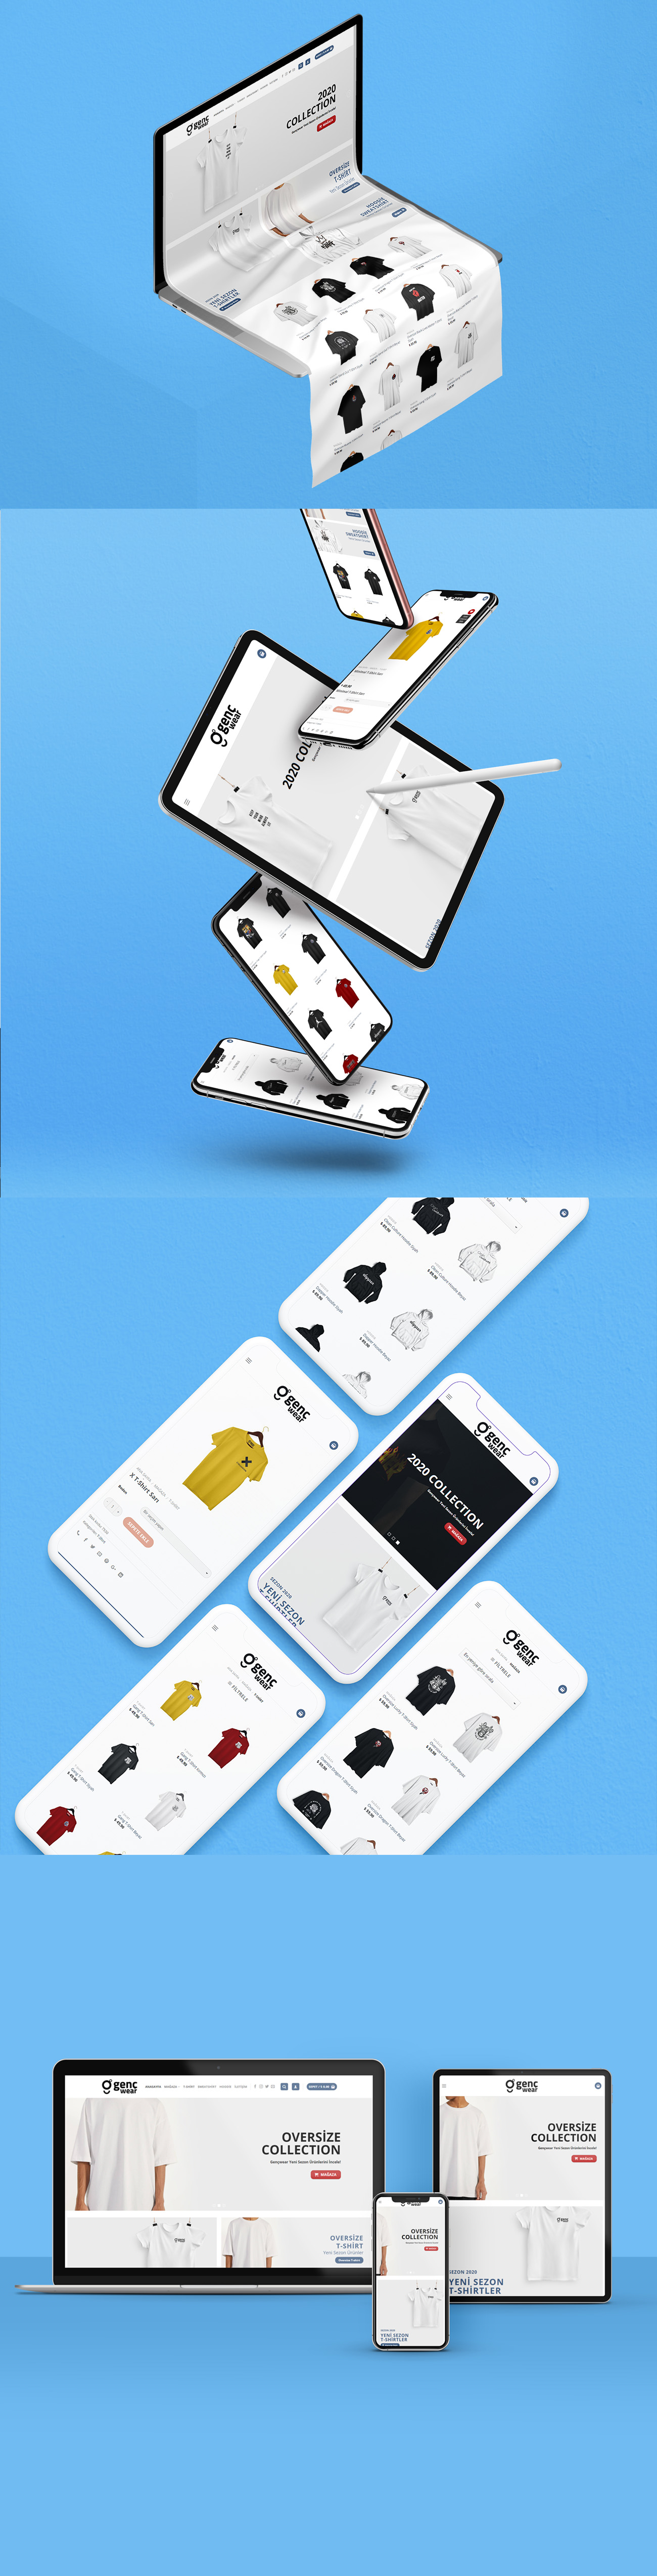 gencwear-e-ticaret-web-tasarim